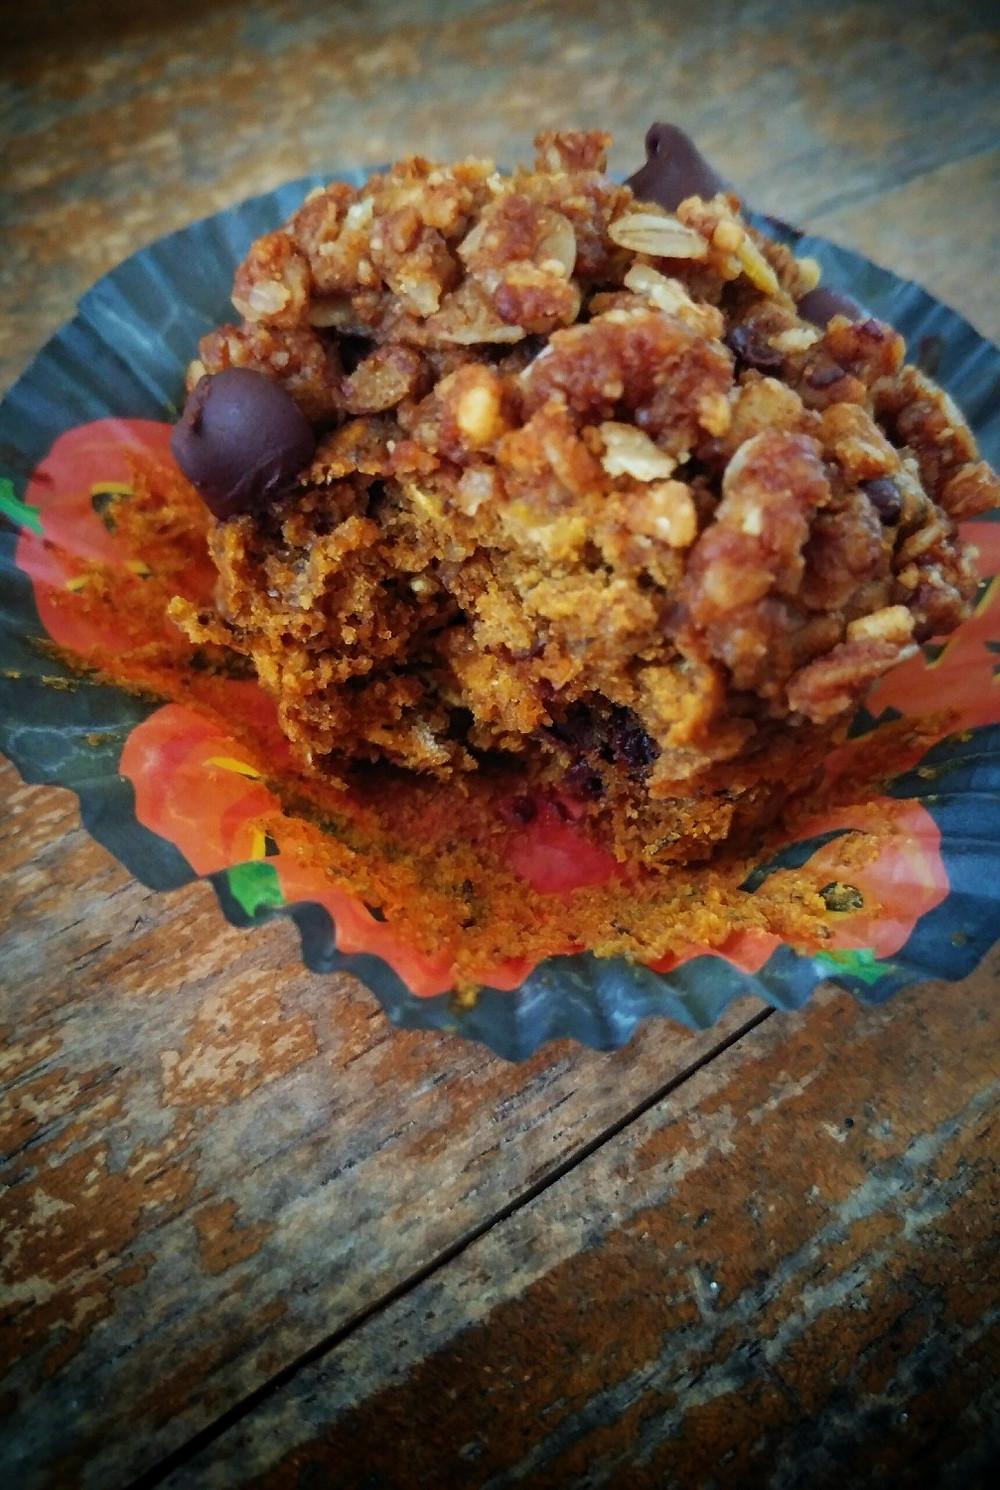 Fall Chocolate Chip Peanut Butter Muffins